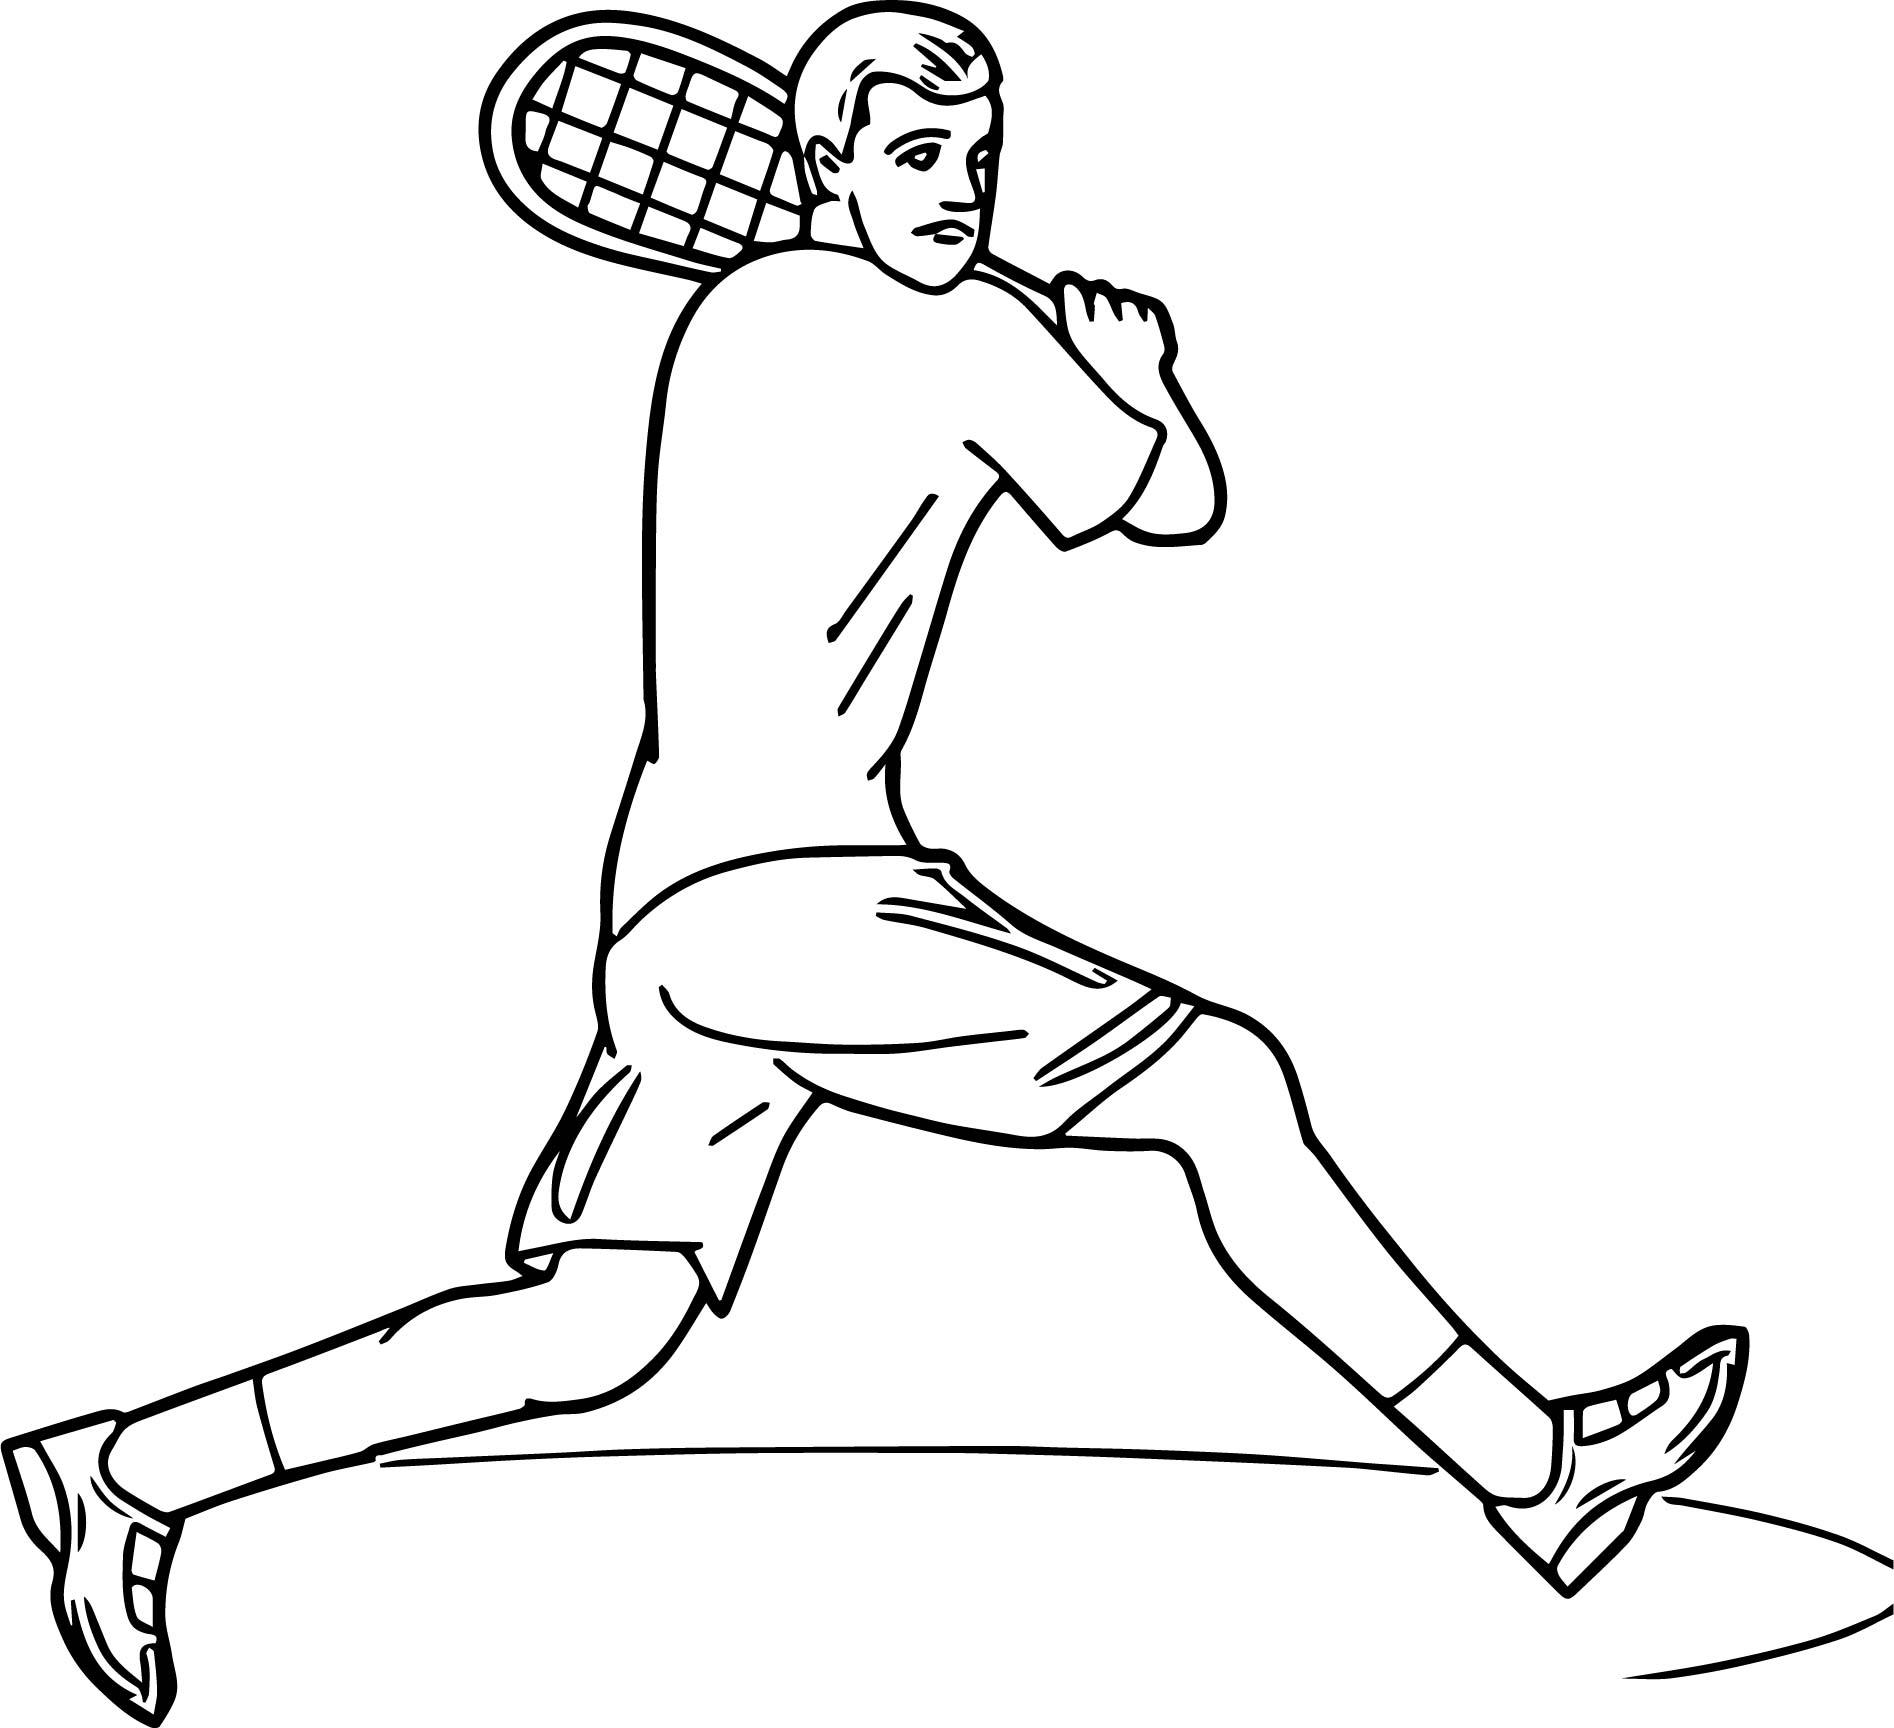 Tennis Backstroke Coloring Page